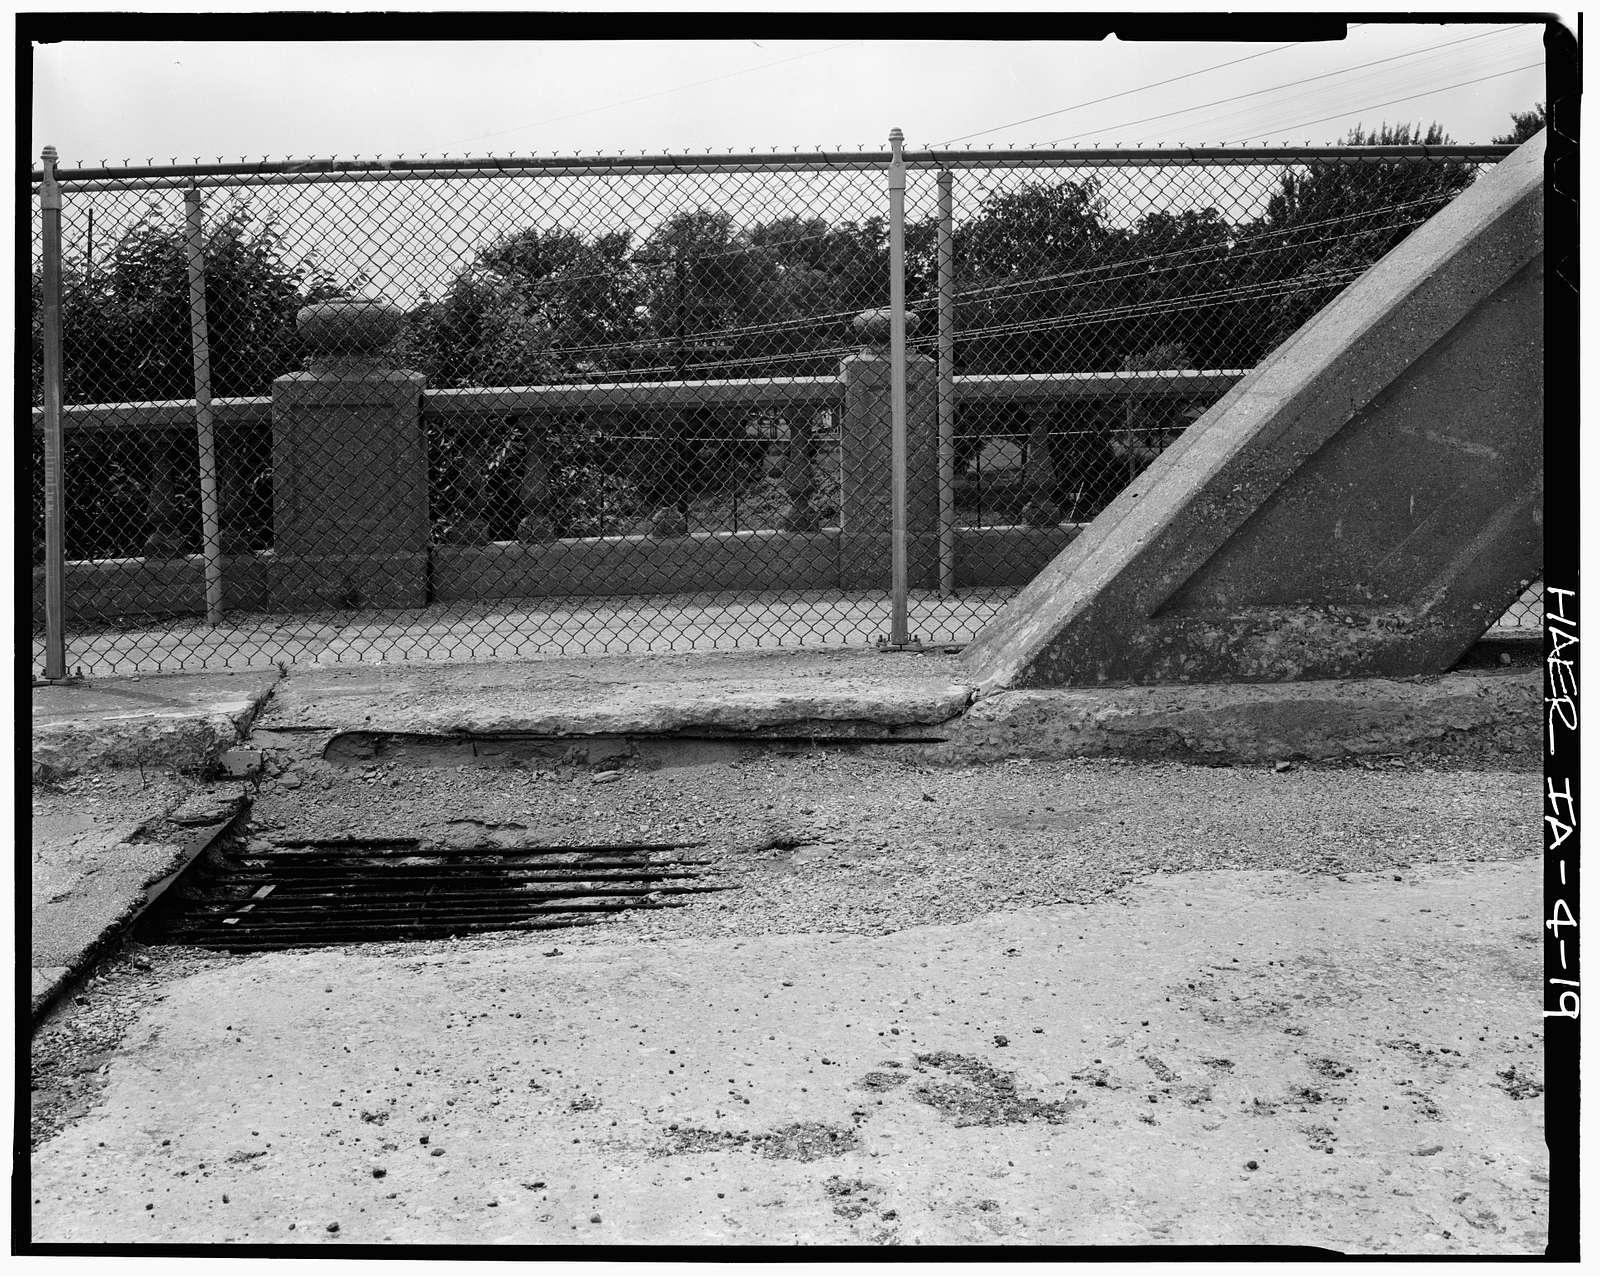 Marsh Rainbow Arch Bridge, West Eighth Street North, Newton, Jasper County, IA